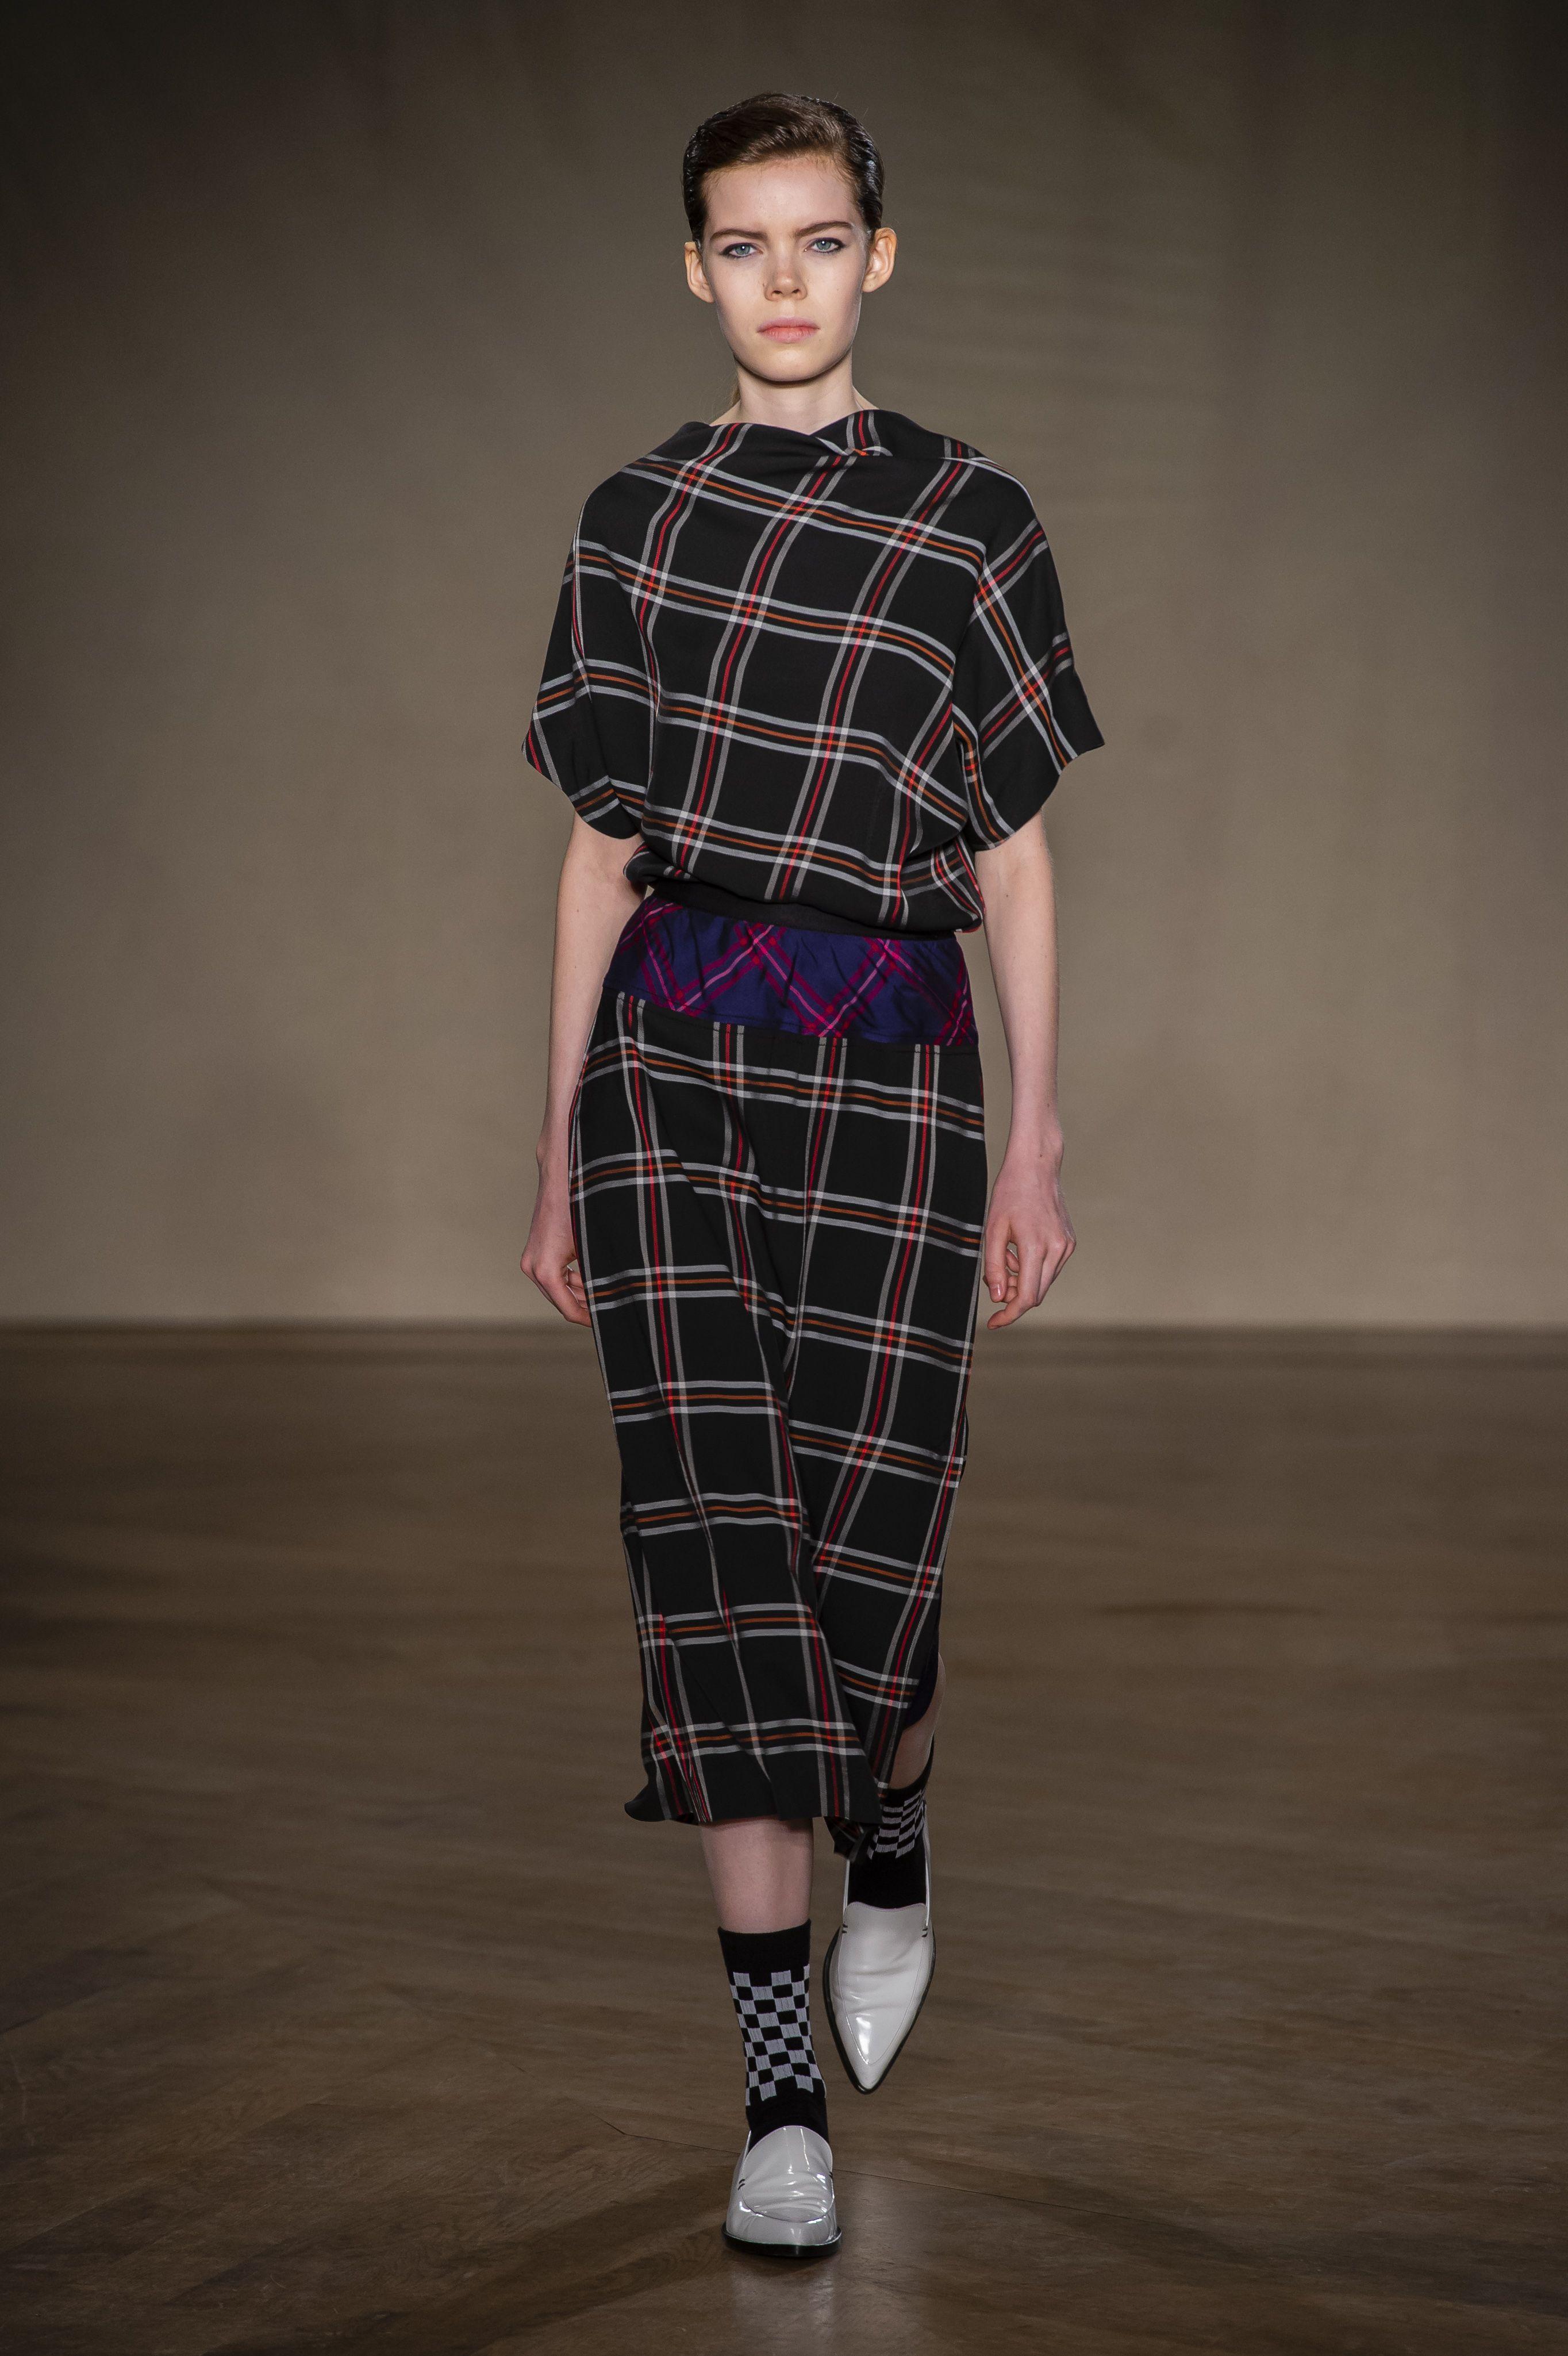 Paul Smith SpringSummer 2019 Collection – London Fashion Week